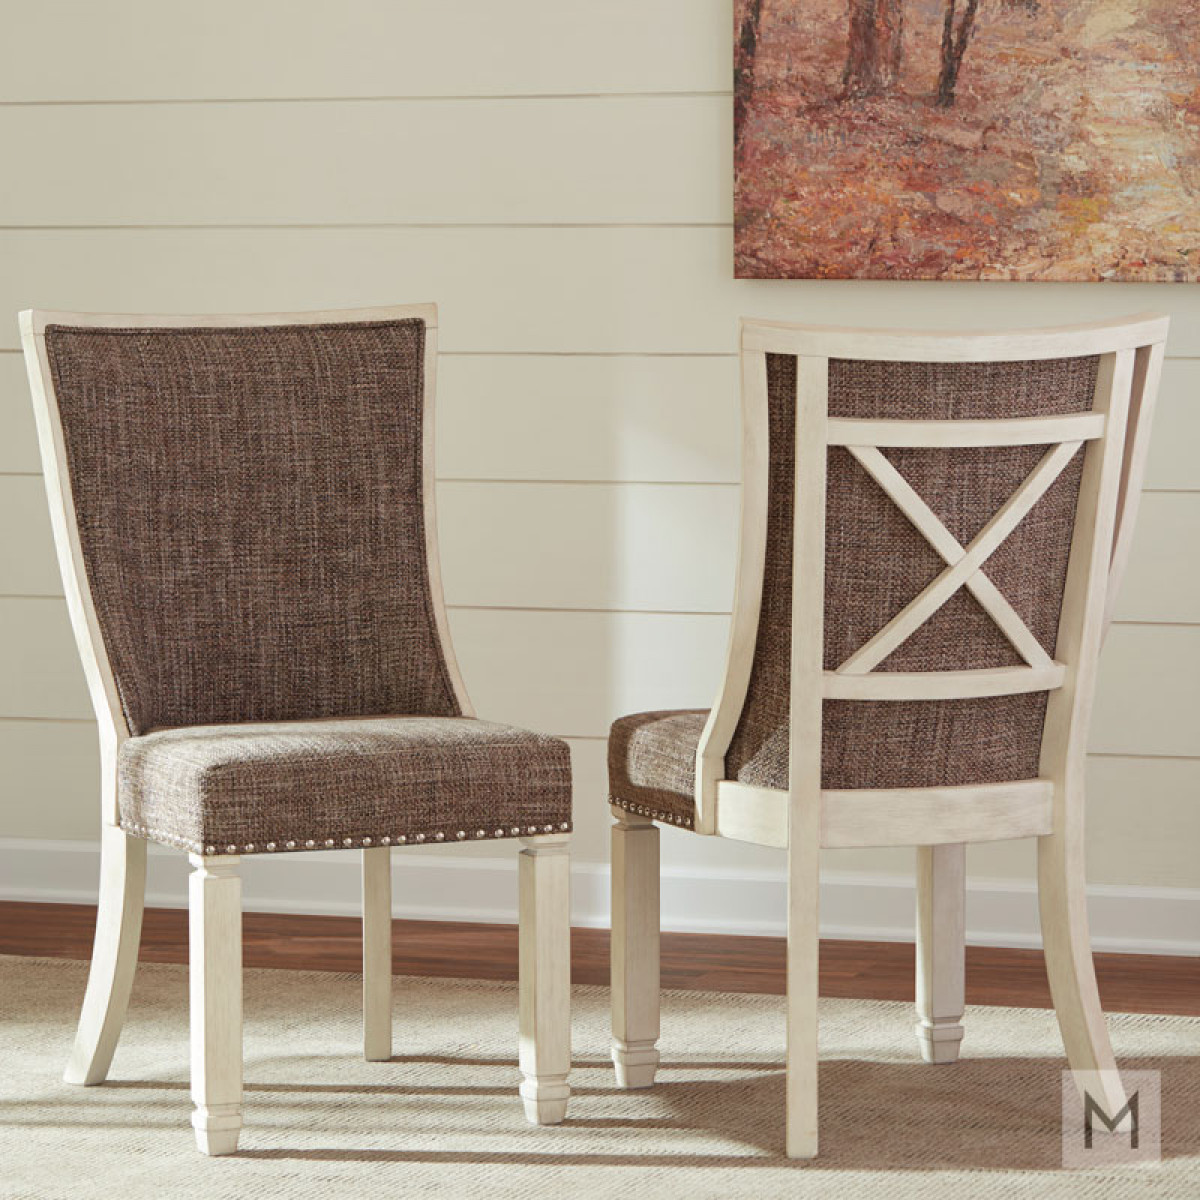 Bolanburg Upholstered Dining Chair in Vintage White